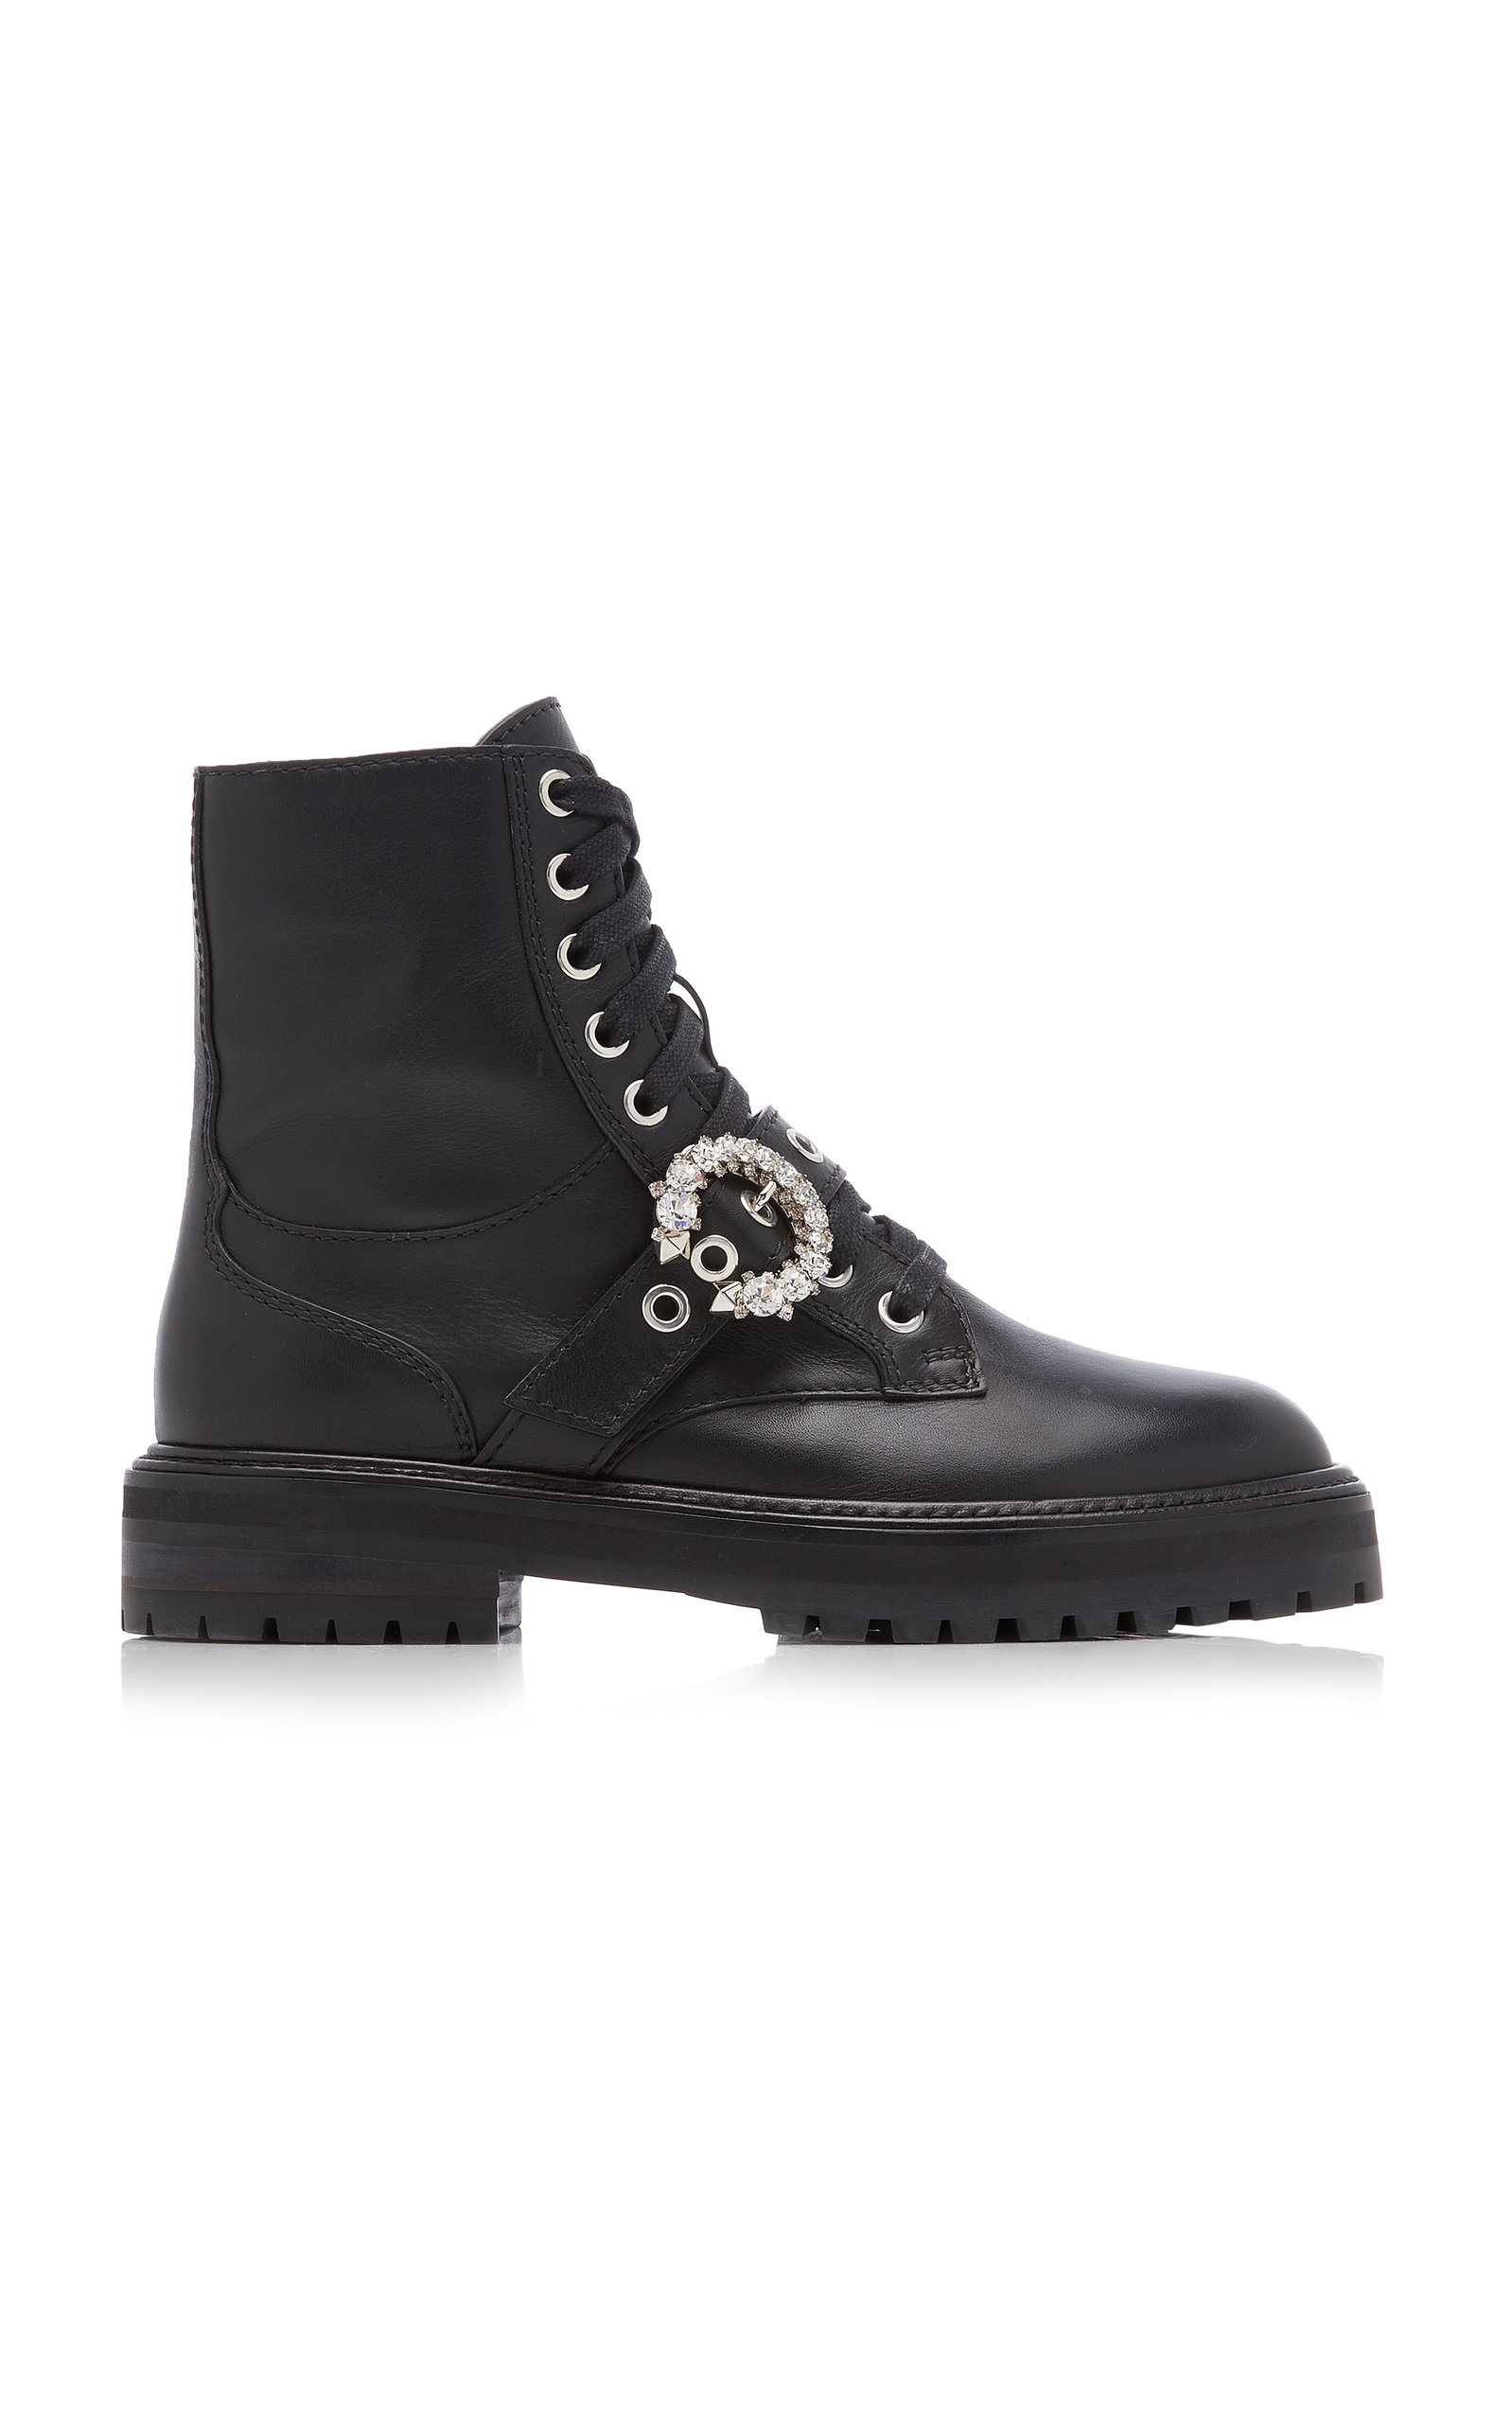 Jimmy Choo - Women's Cora Embellished Leather Combat Boots - Black - Moda Operandi